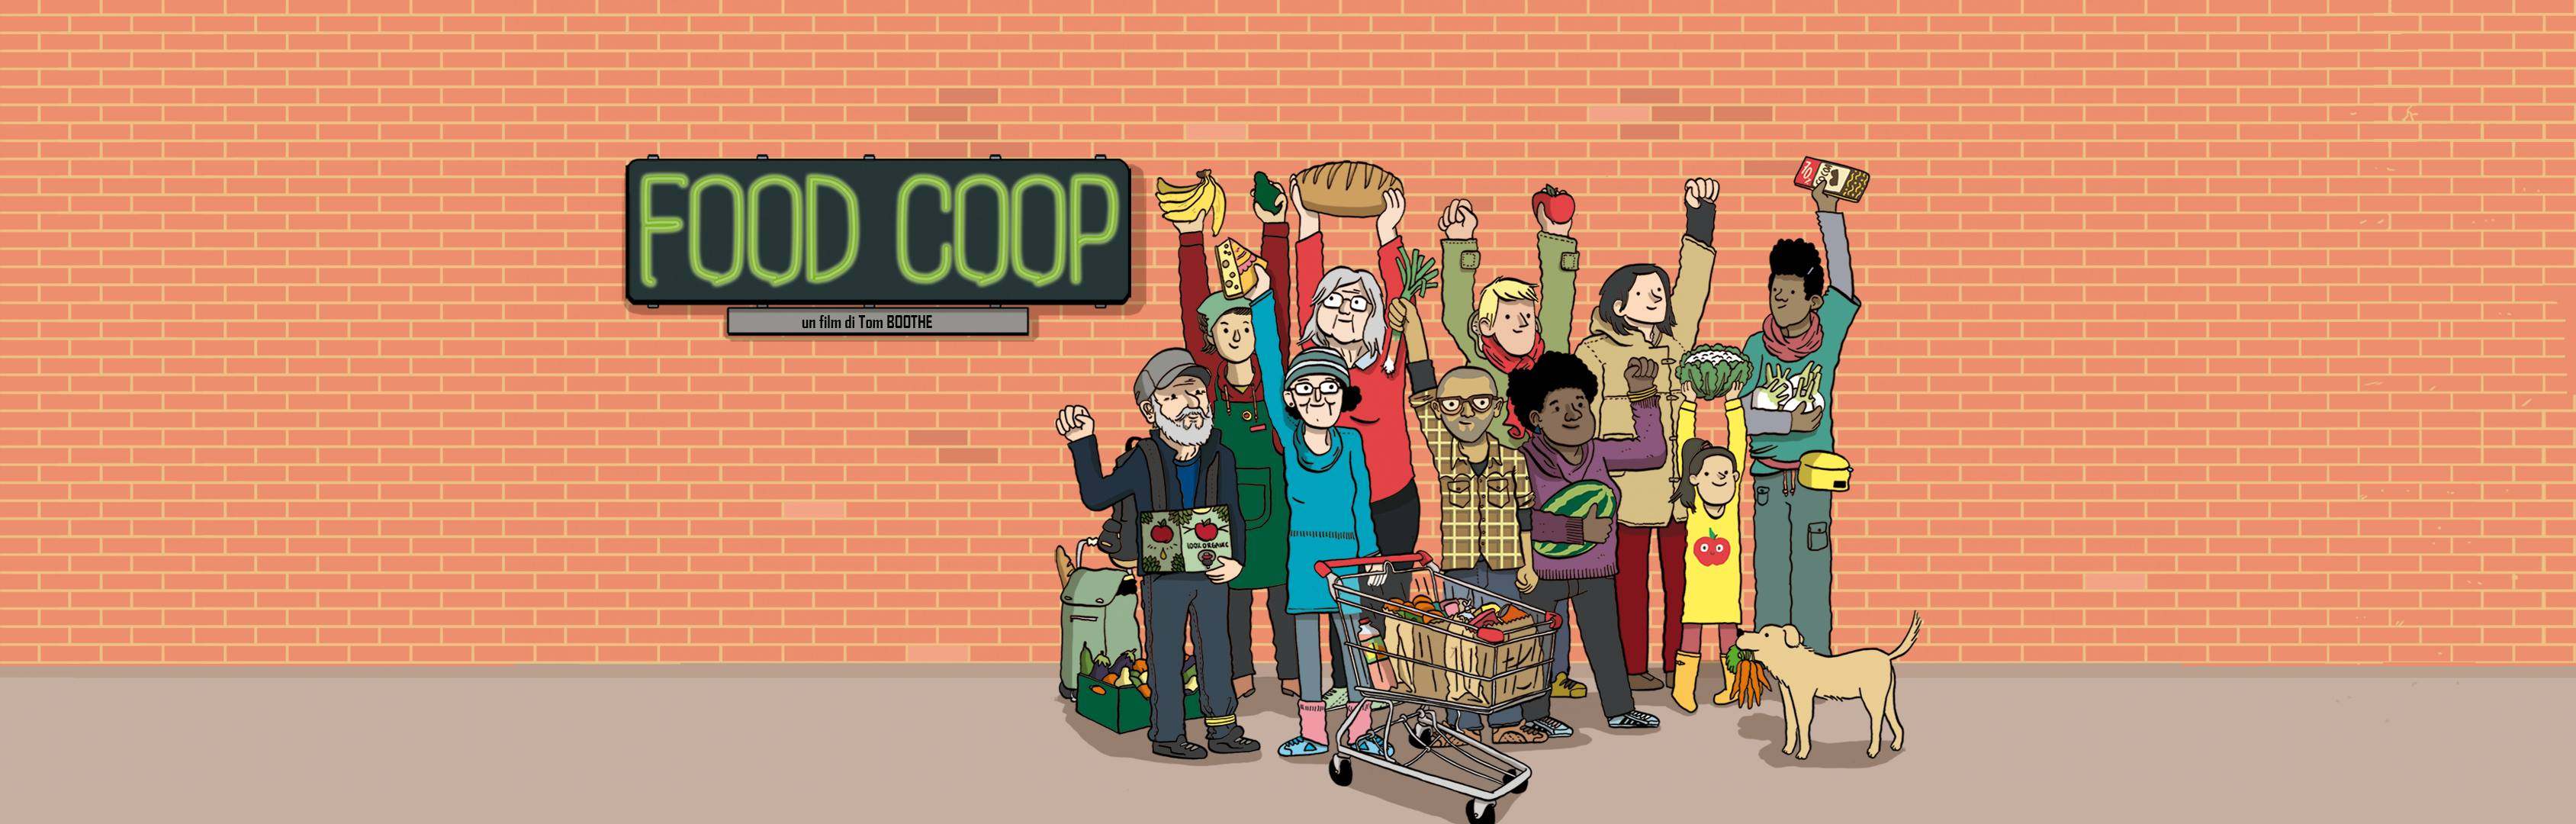 food coop cover facebook